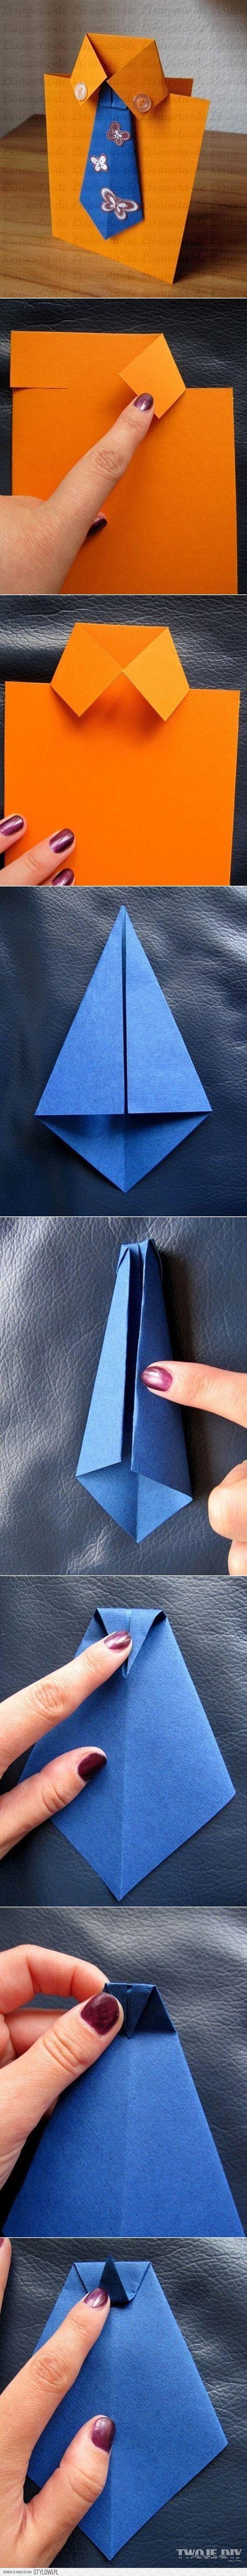 Cute DIY Father's Day Card Ideas | Necktie Card by DIY Ready at http://diyready.com/21-diy-fathers-day-cards/: